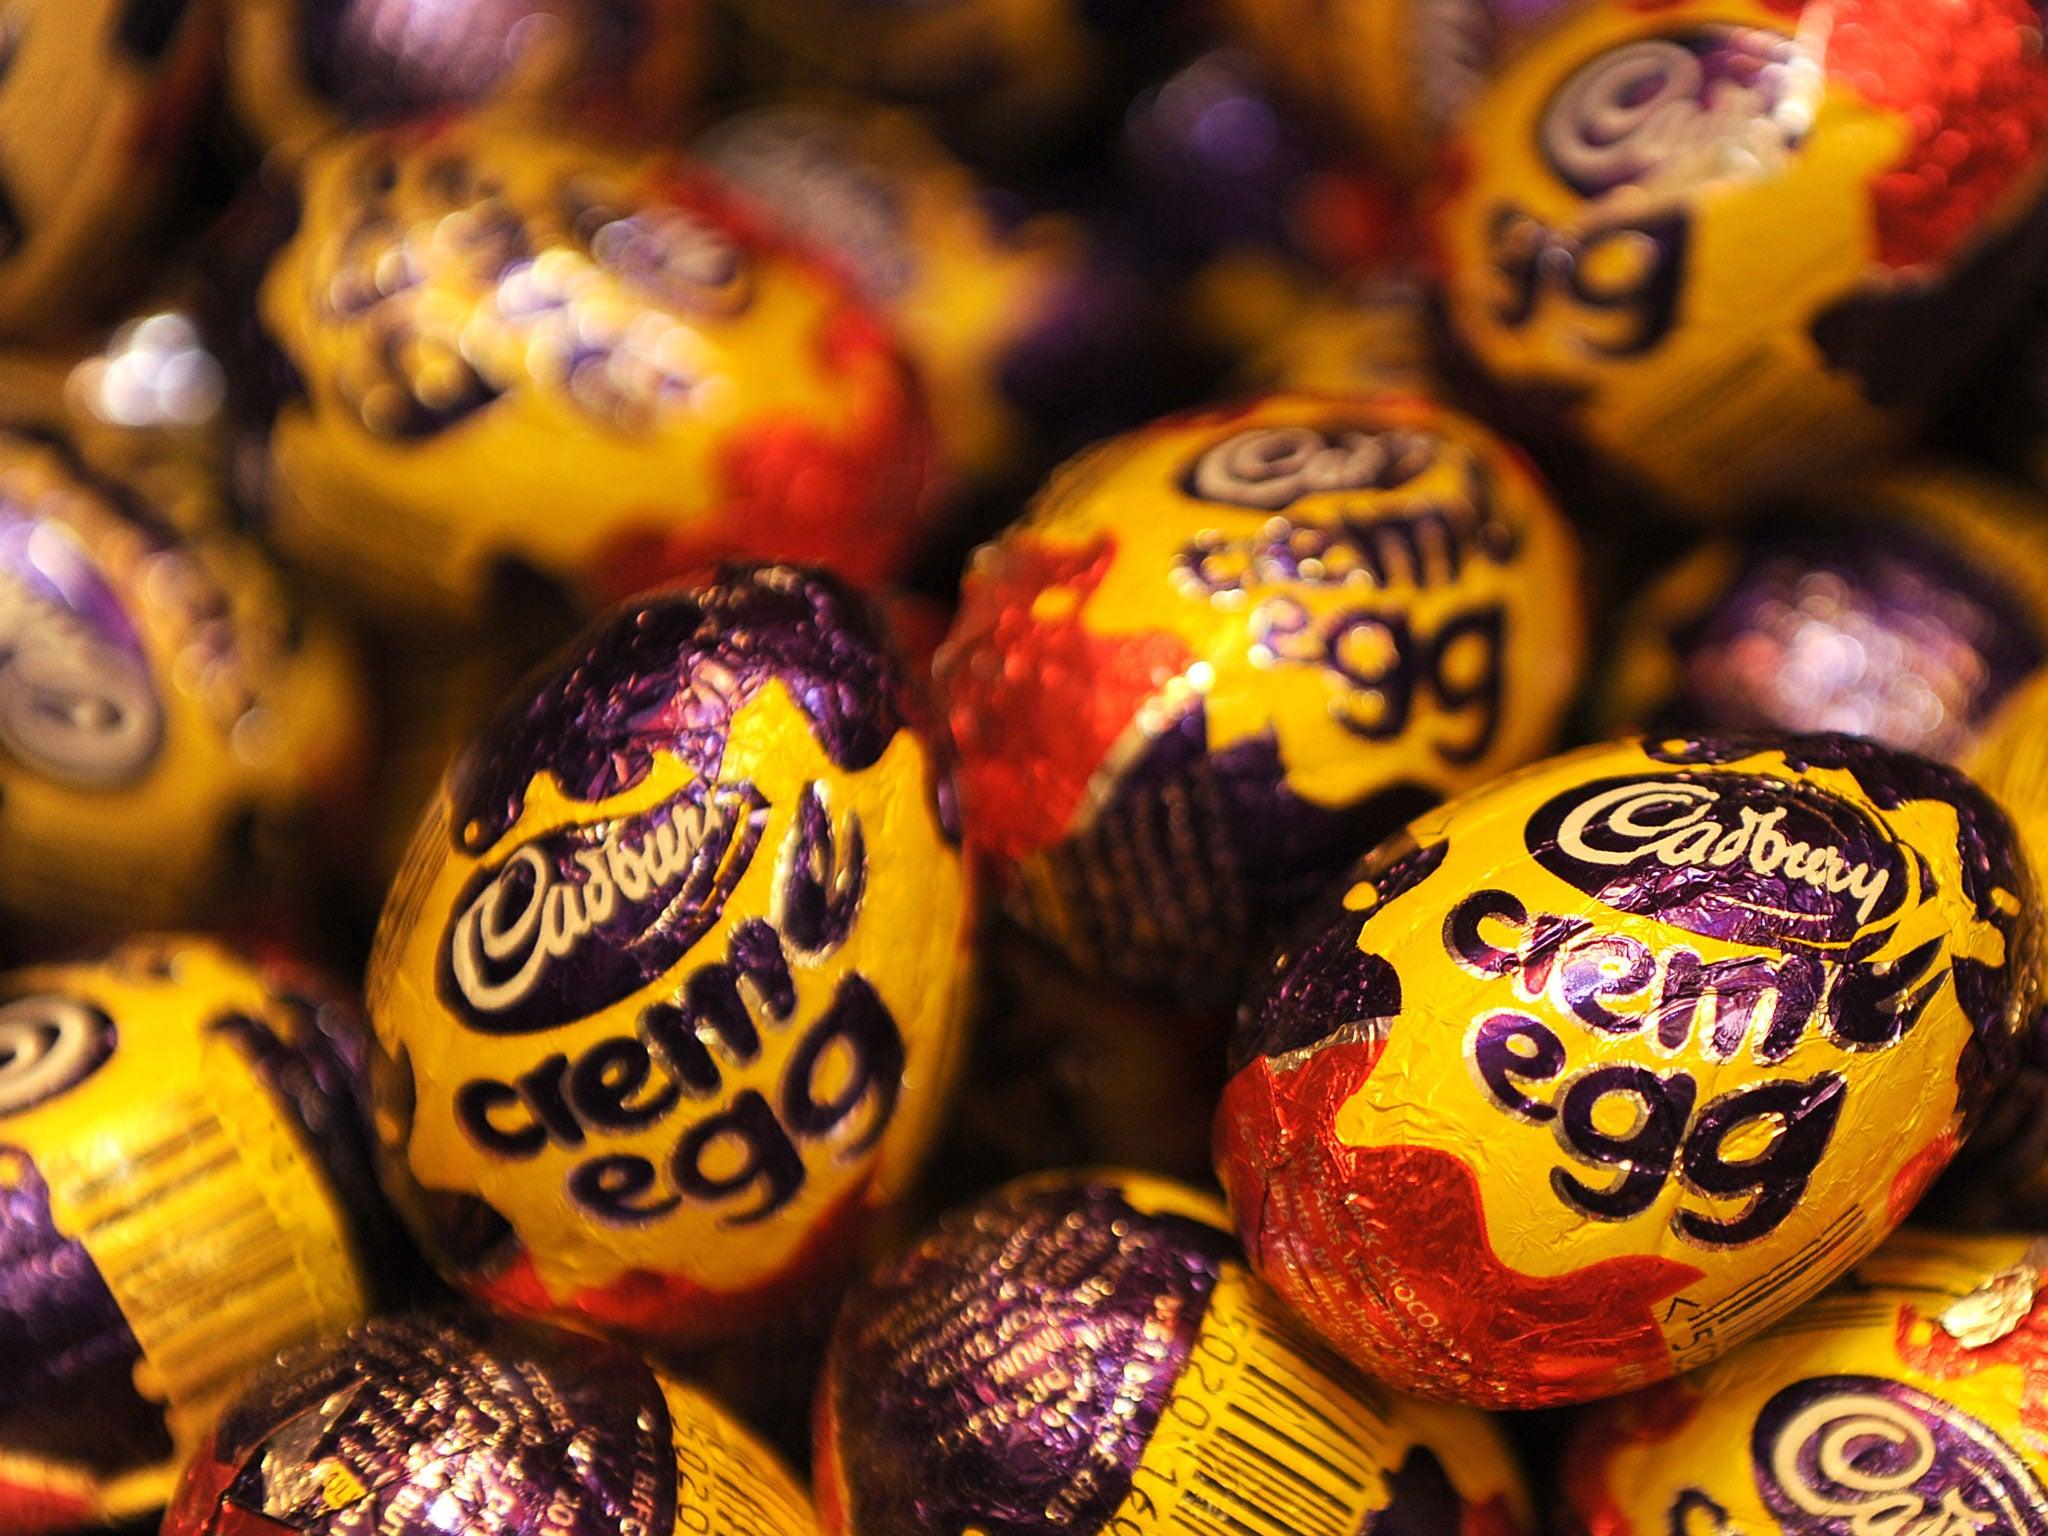 cadburys creme egg announcement - HD2048×1536